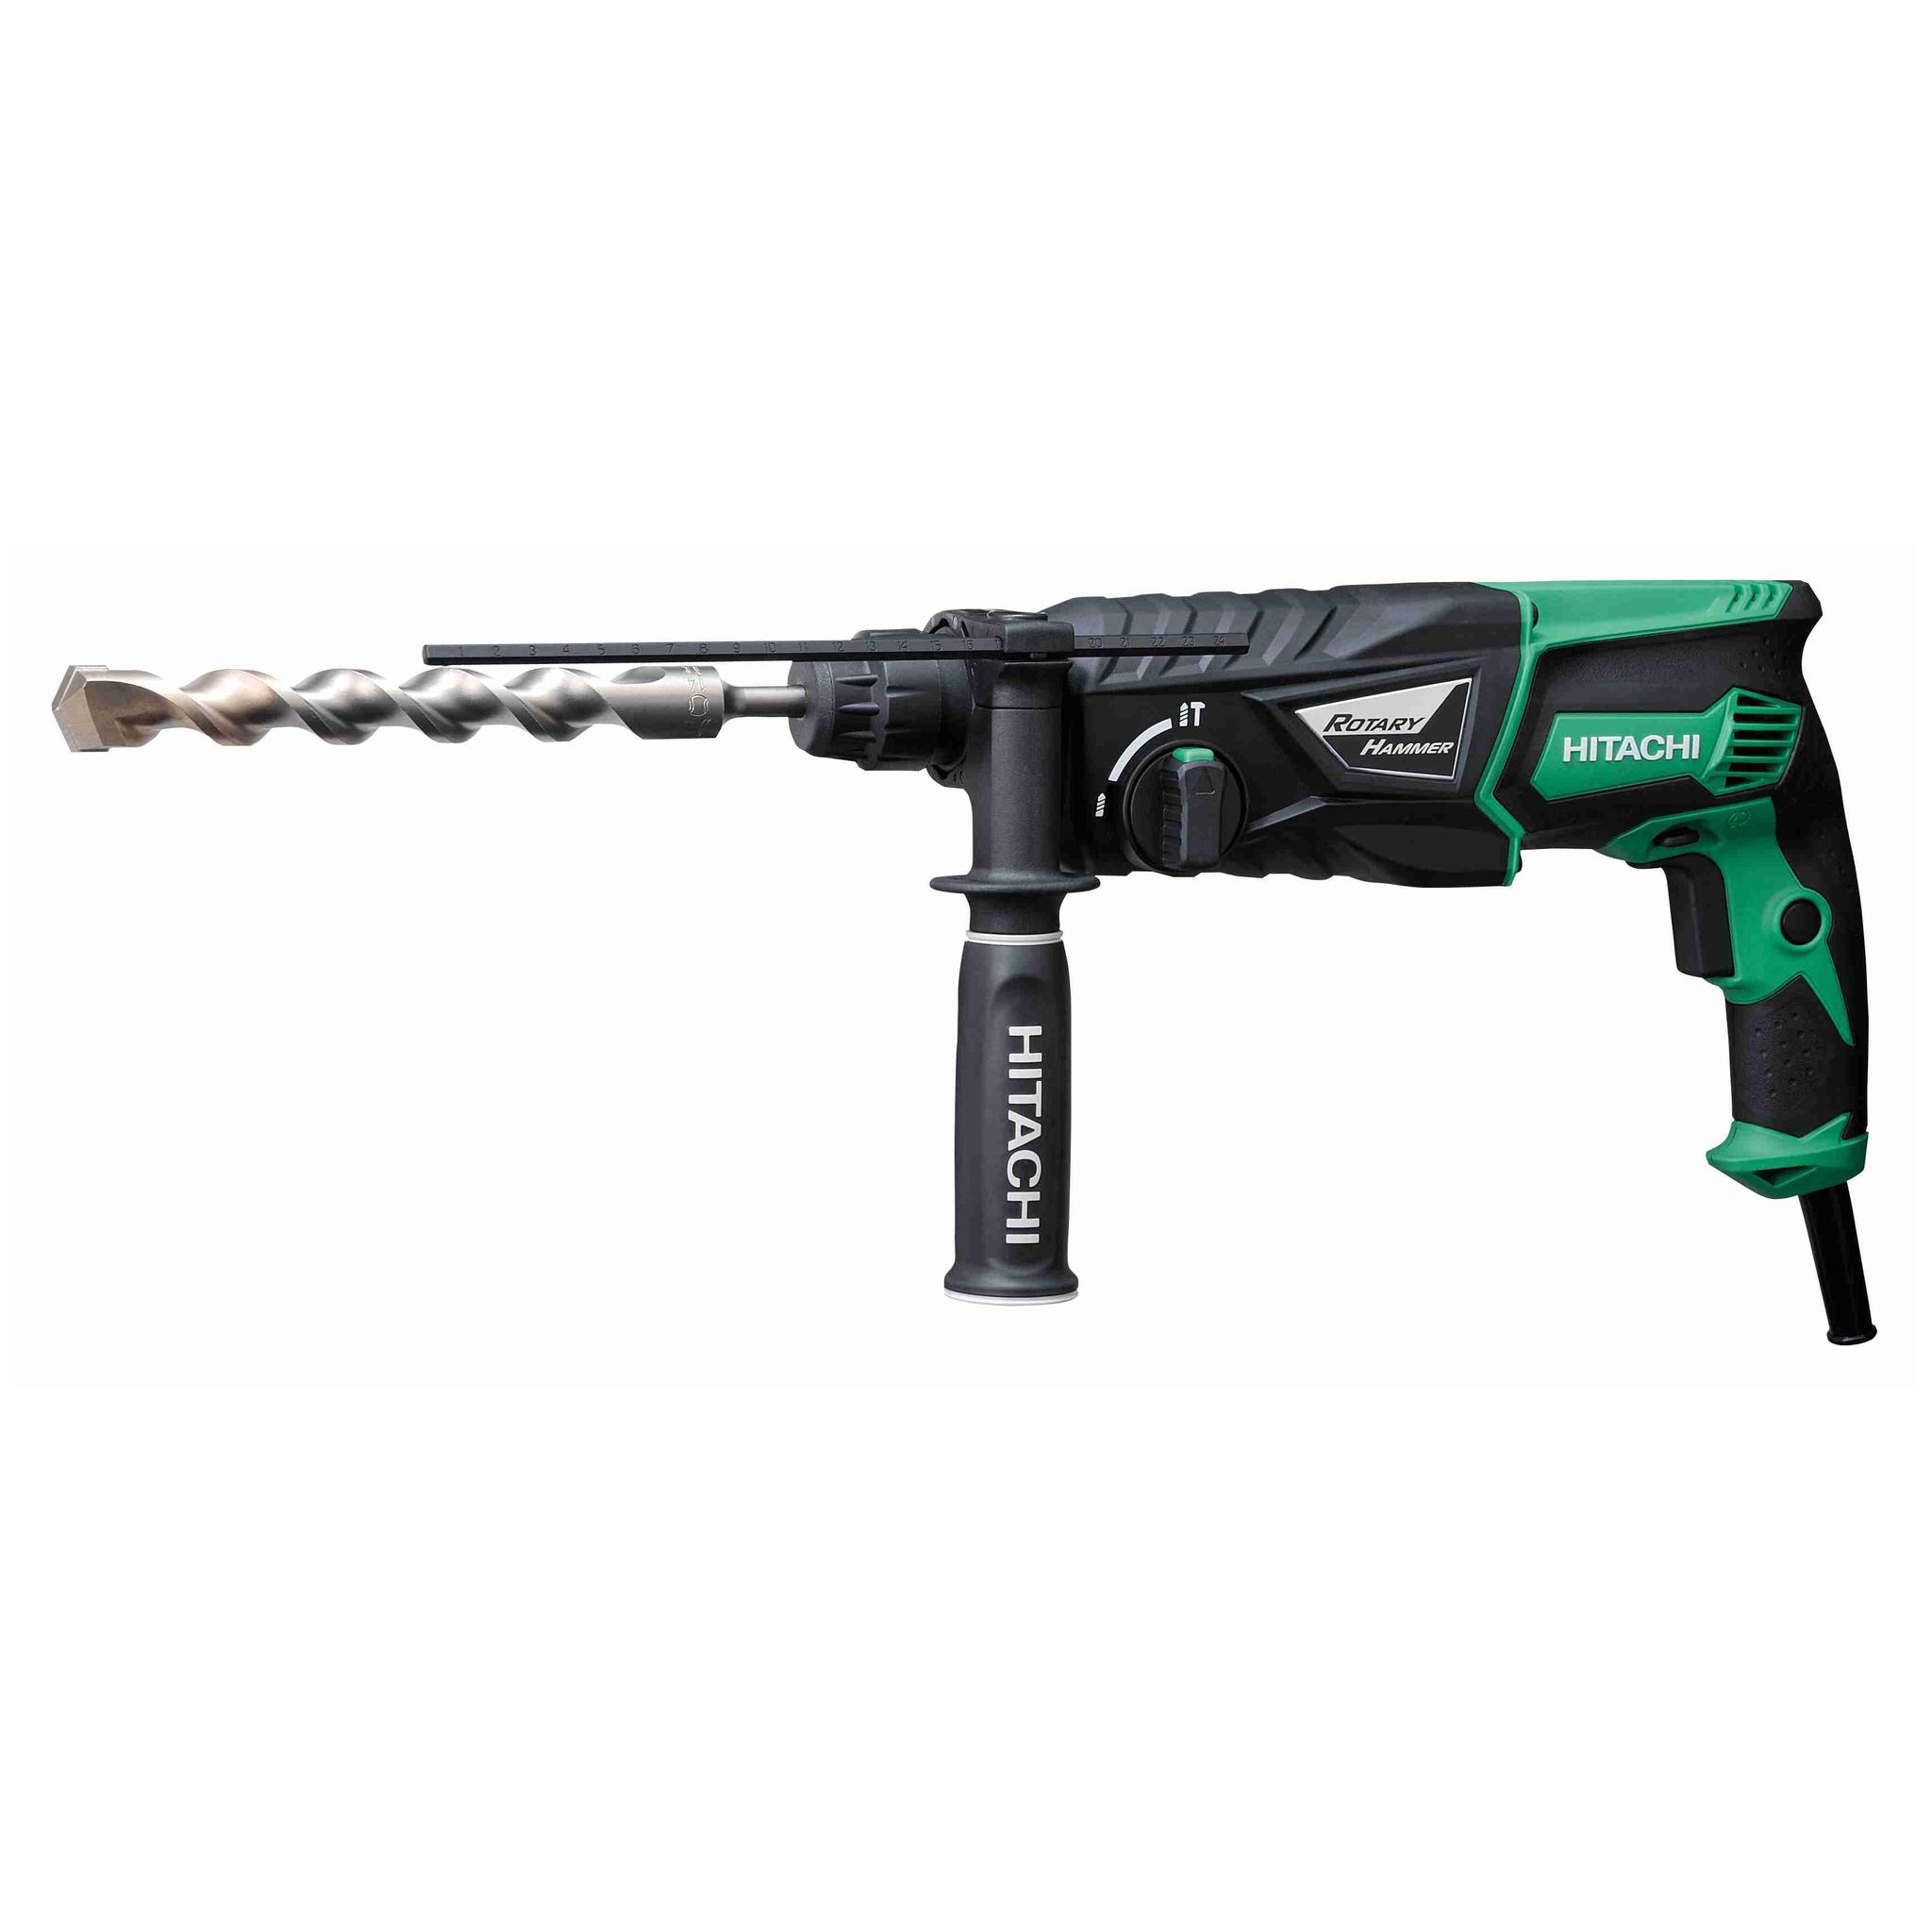 Mesin Bor Listrik / Rotary Hammer Hitachi DH26PB / DH 26PB